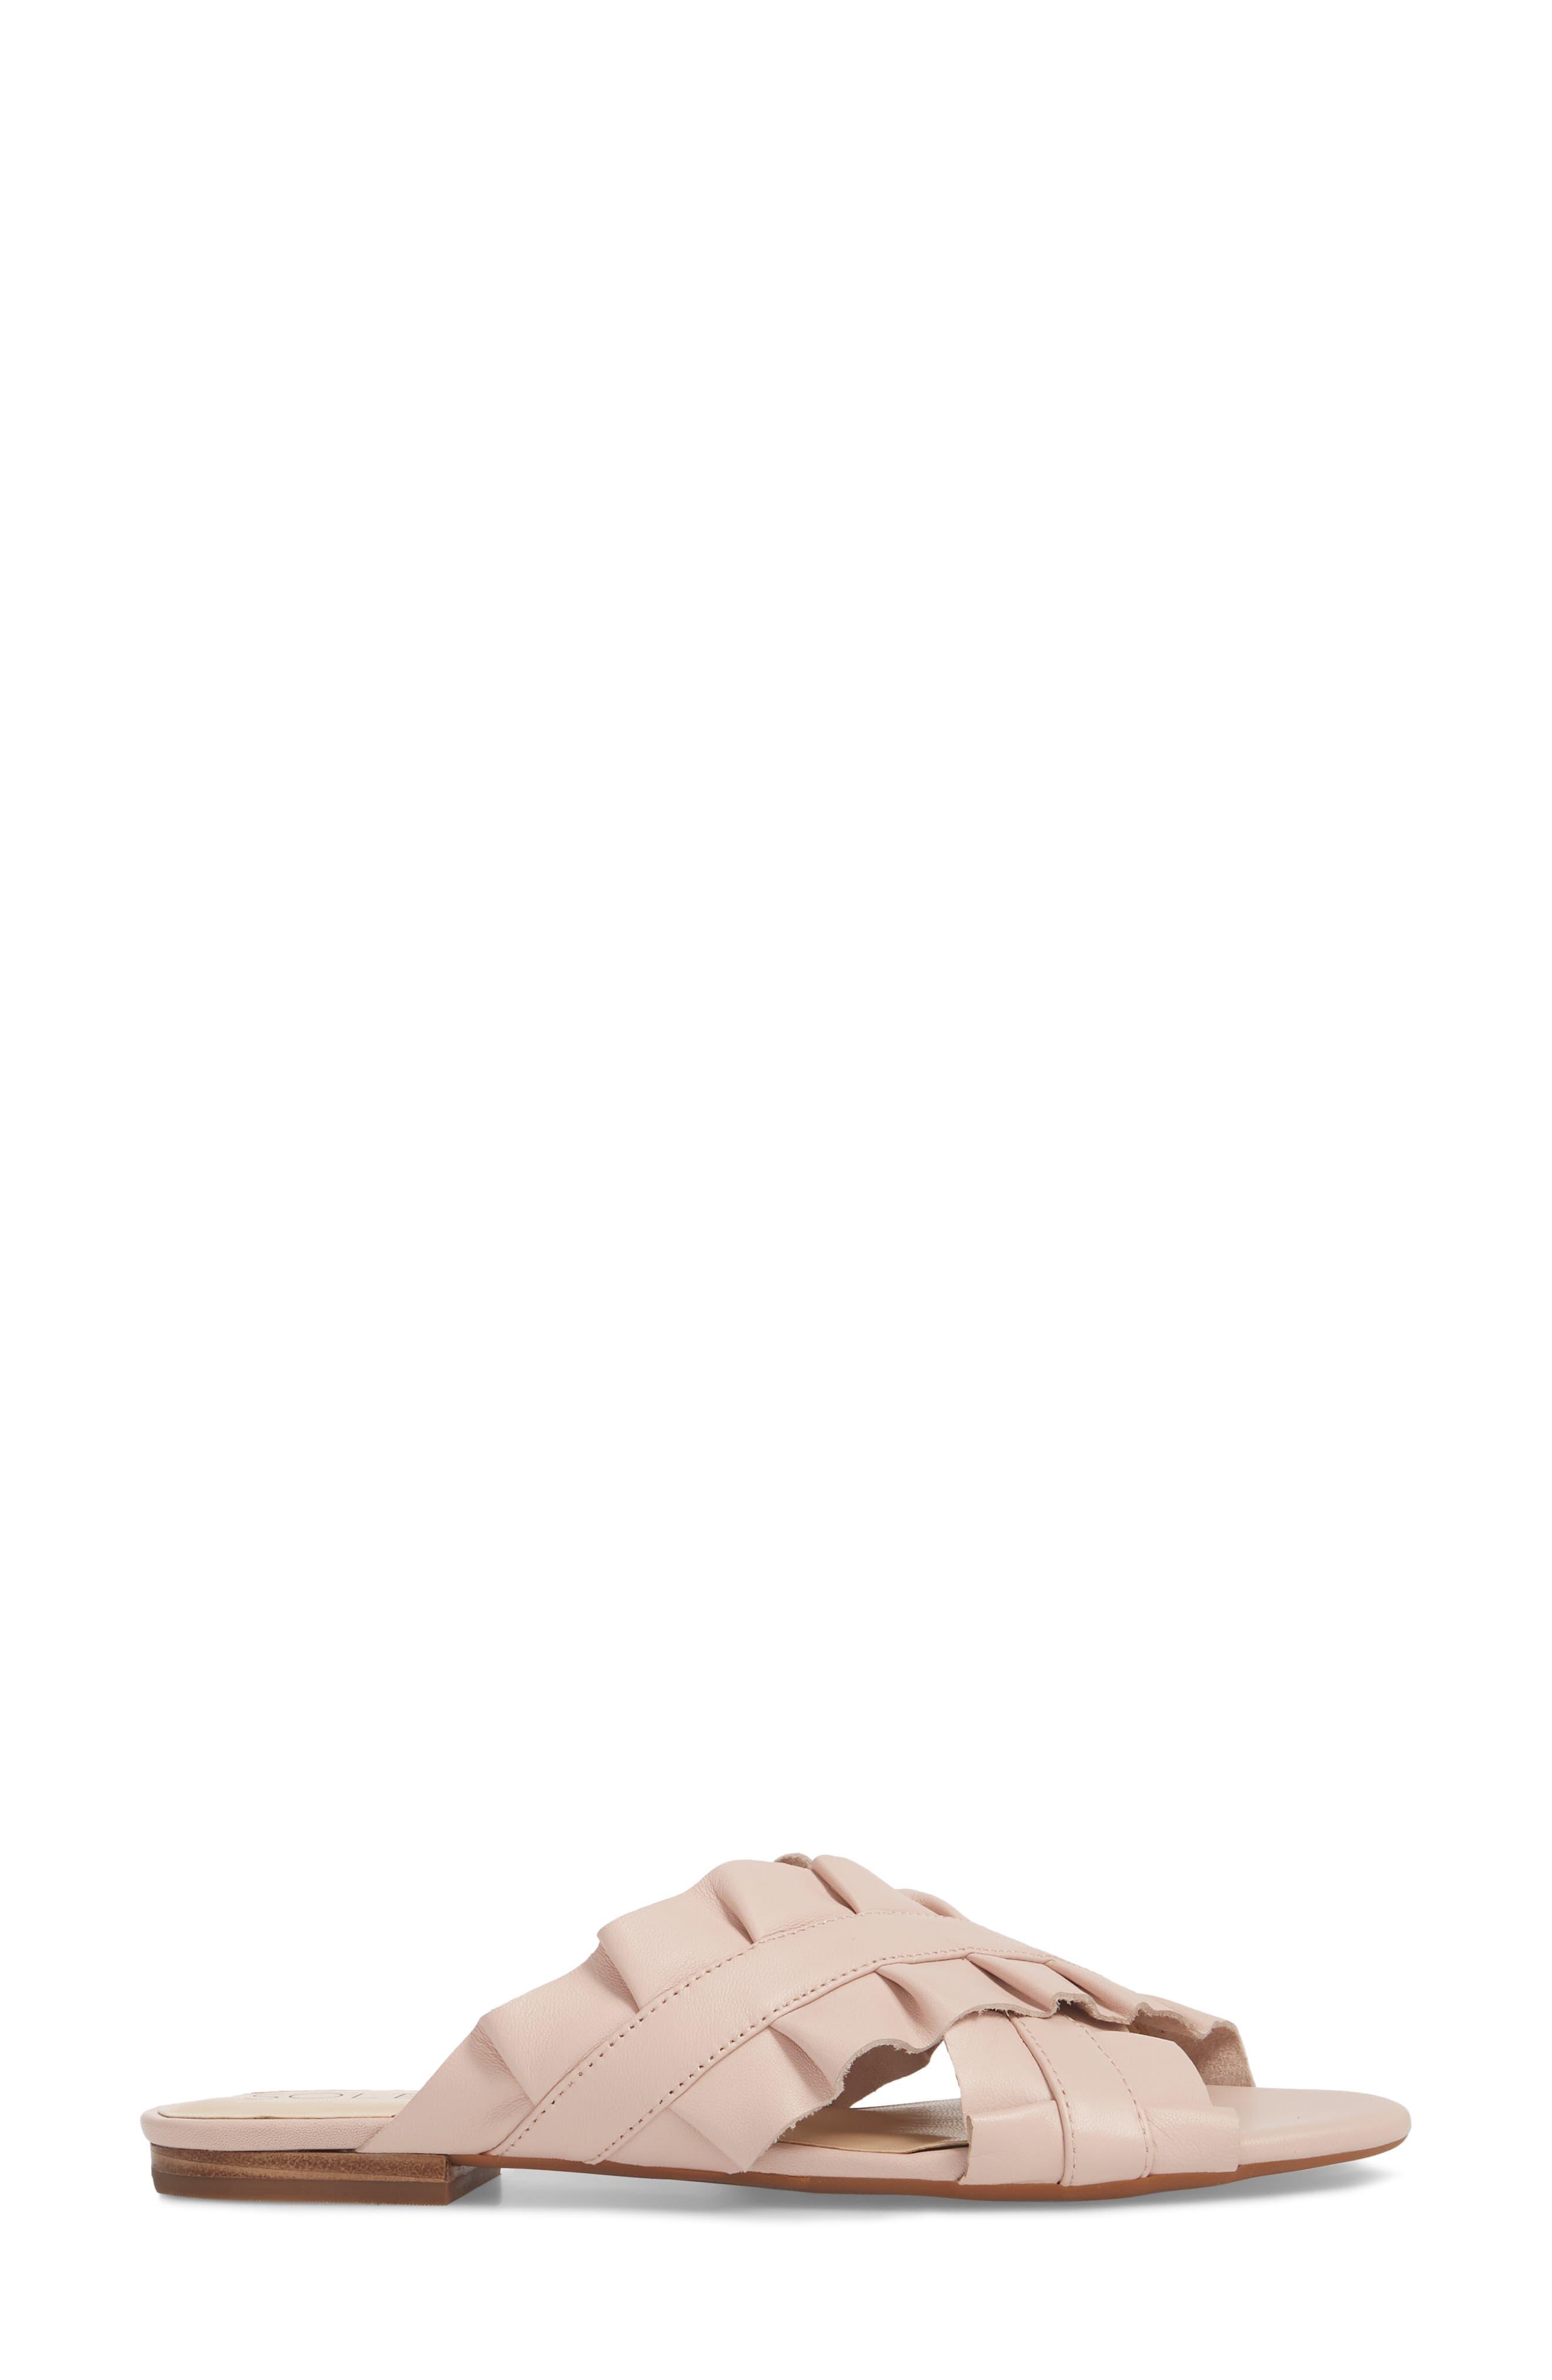 Mandi Slide Sandal,                             Alternate thumbnail 3, color,                             Spring Blush